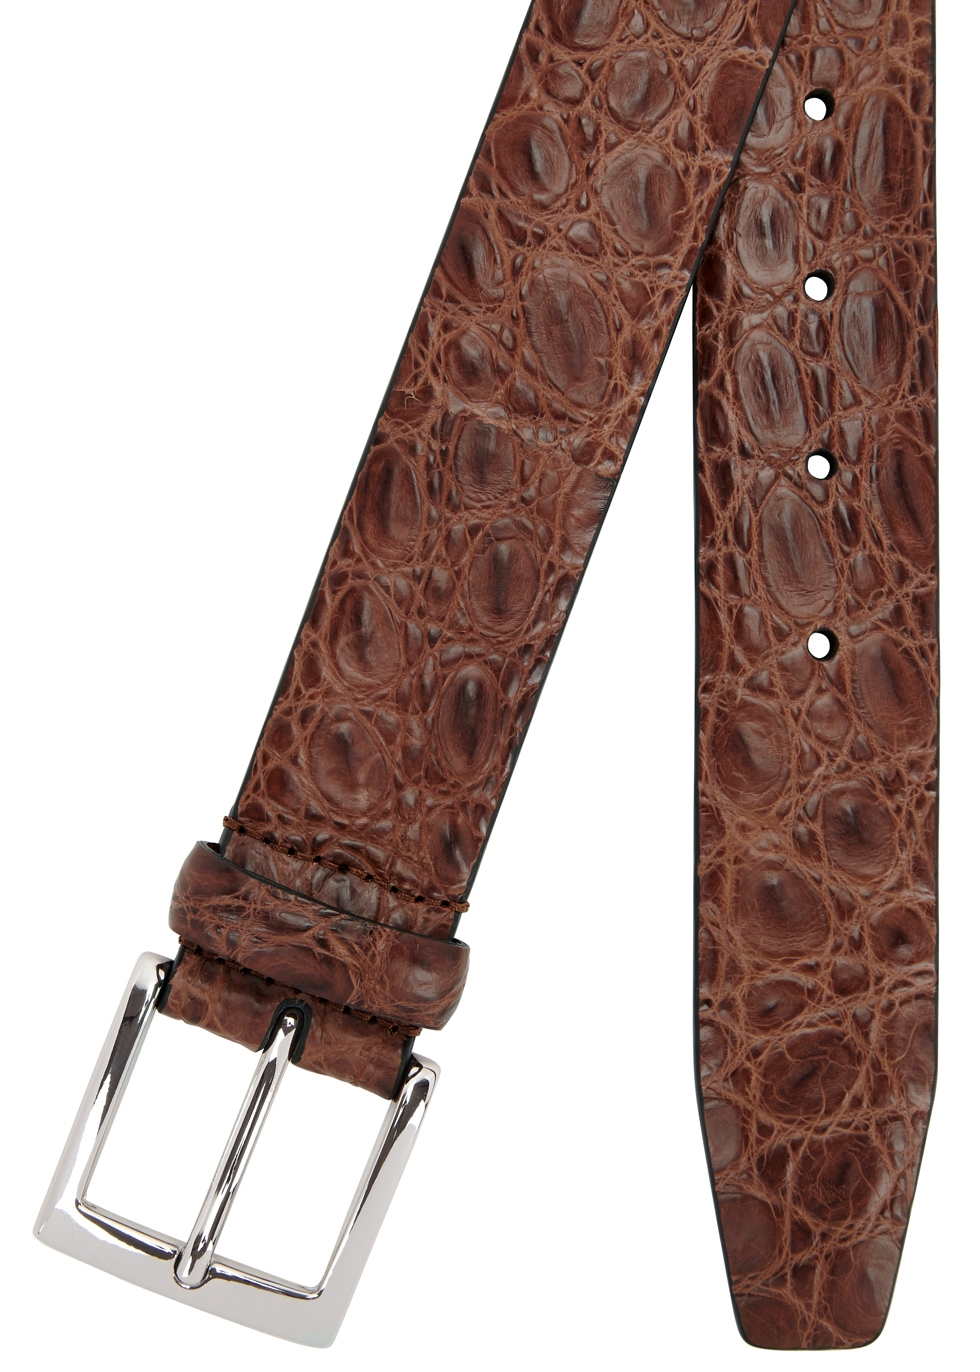 Brown crocodile belt - Anderson's